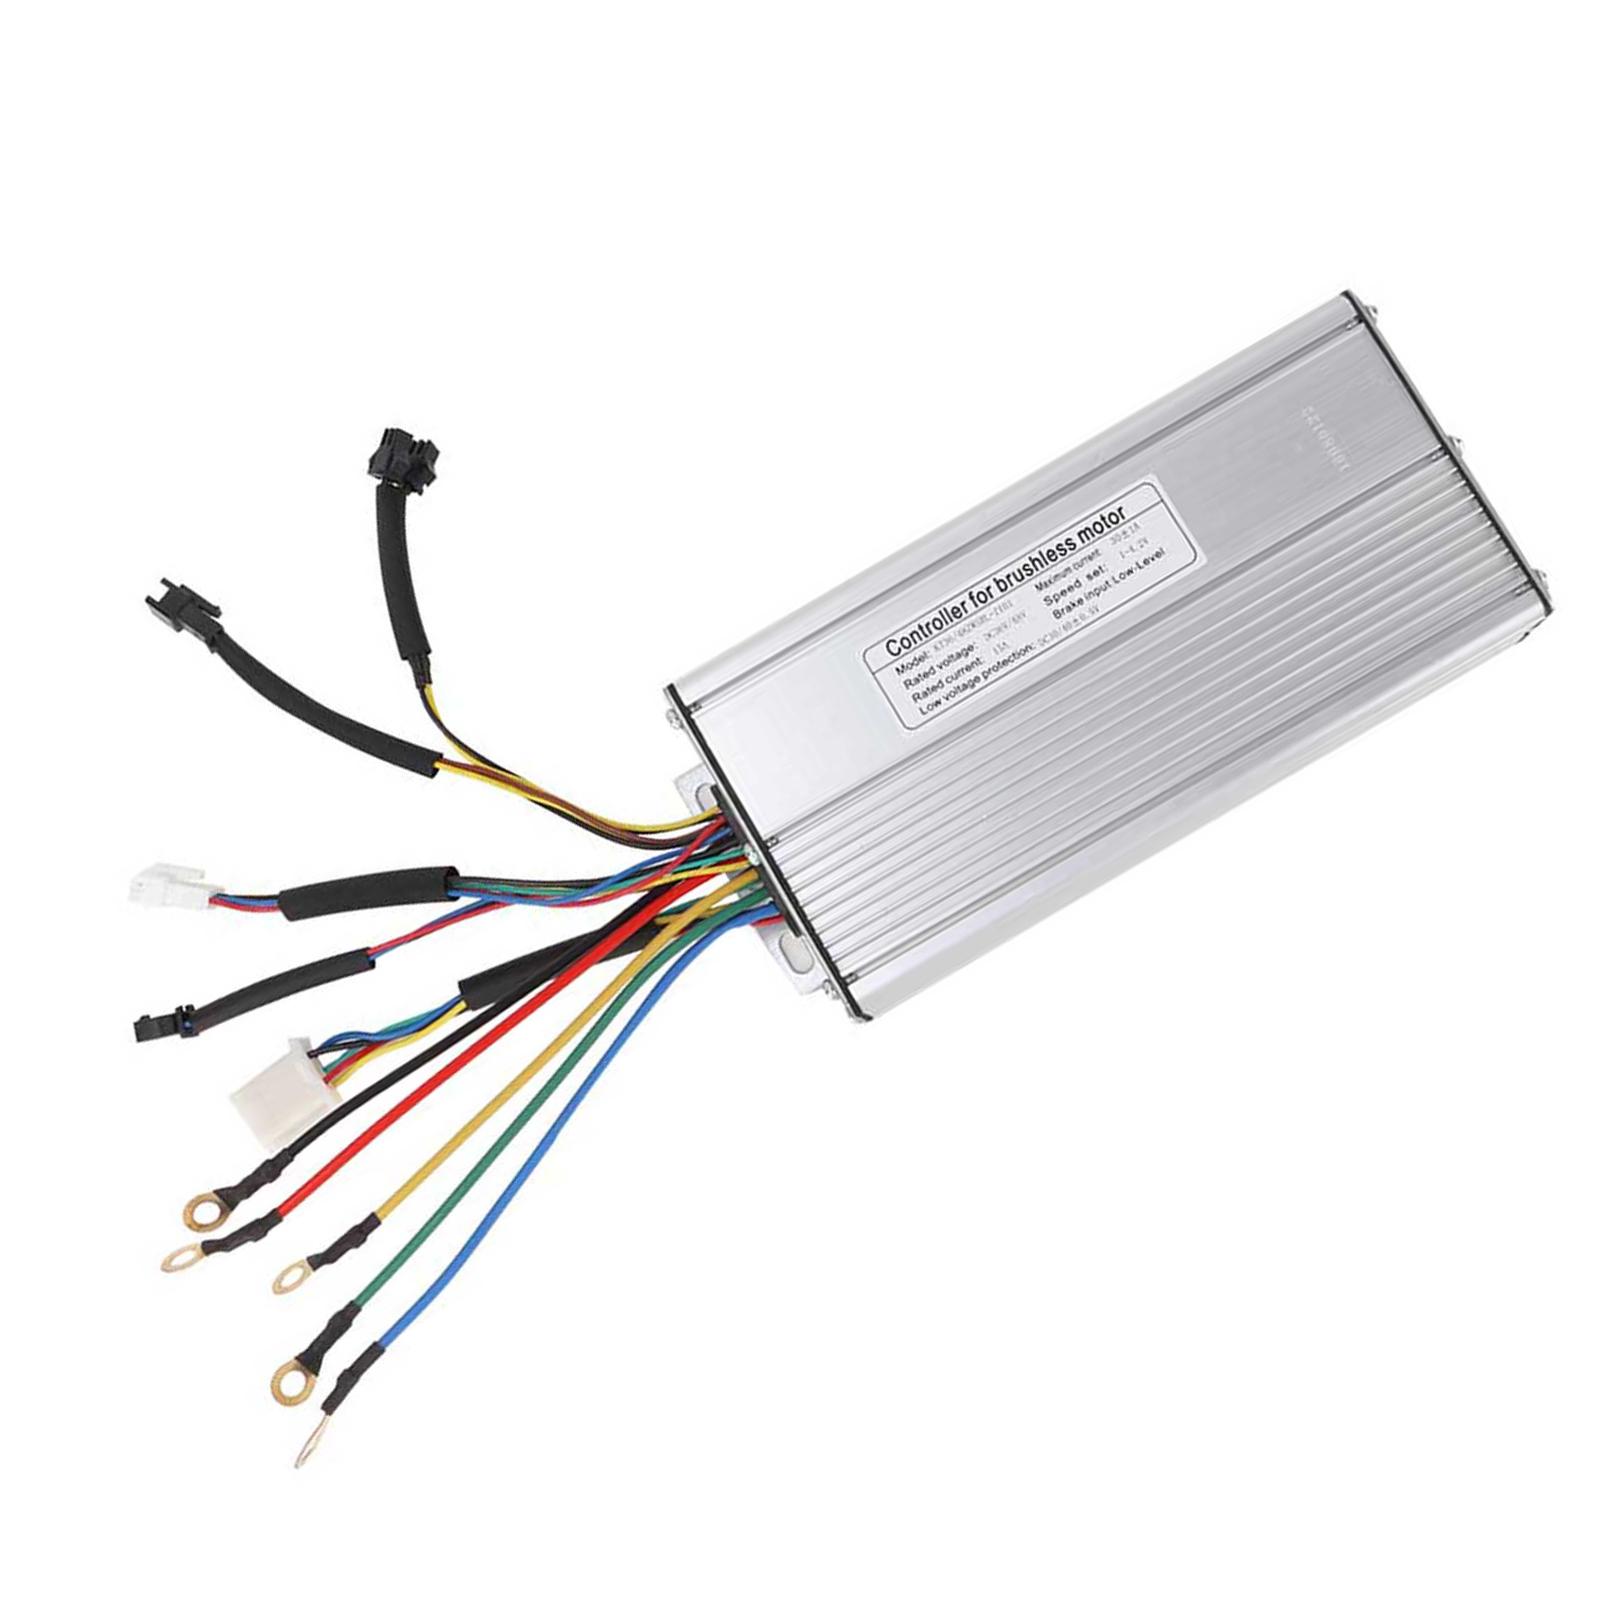 Steuergerät 24V 36//48V 250W//1500W Für Scooter E-Bike Brushless Controller Set